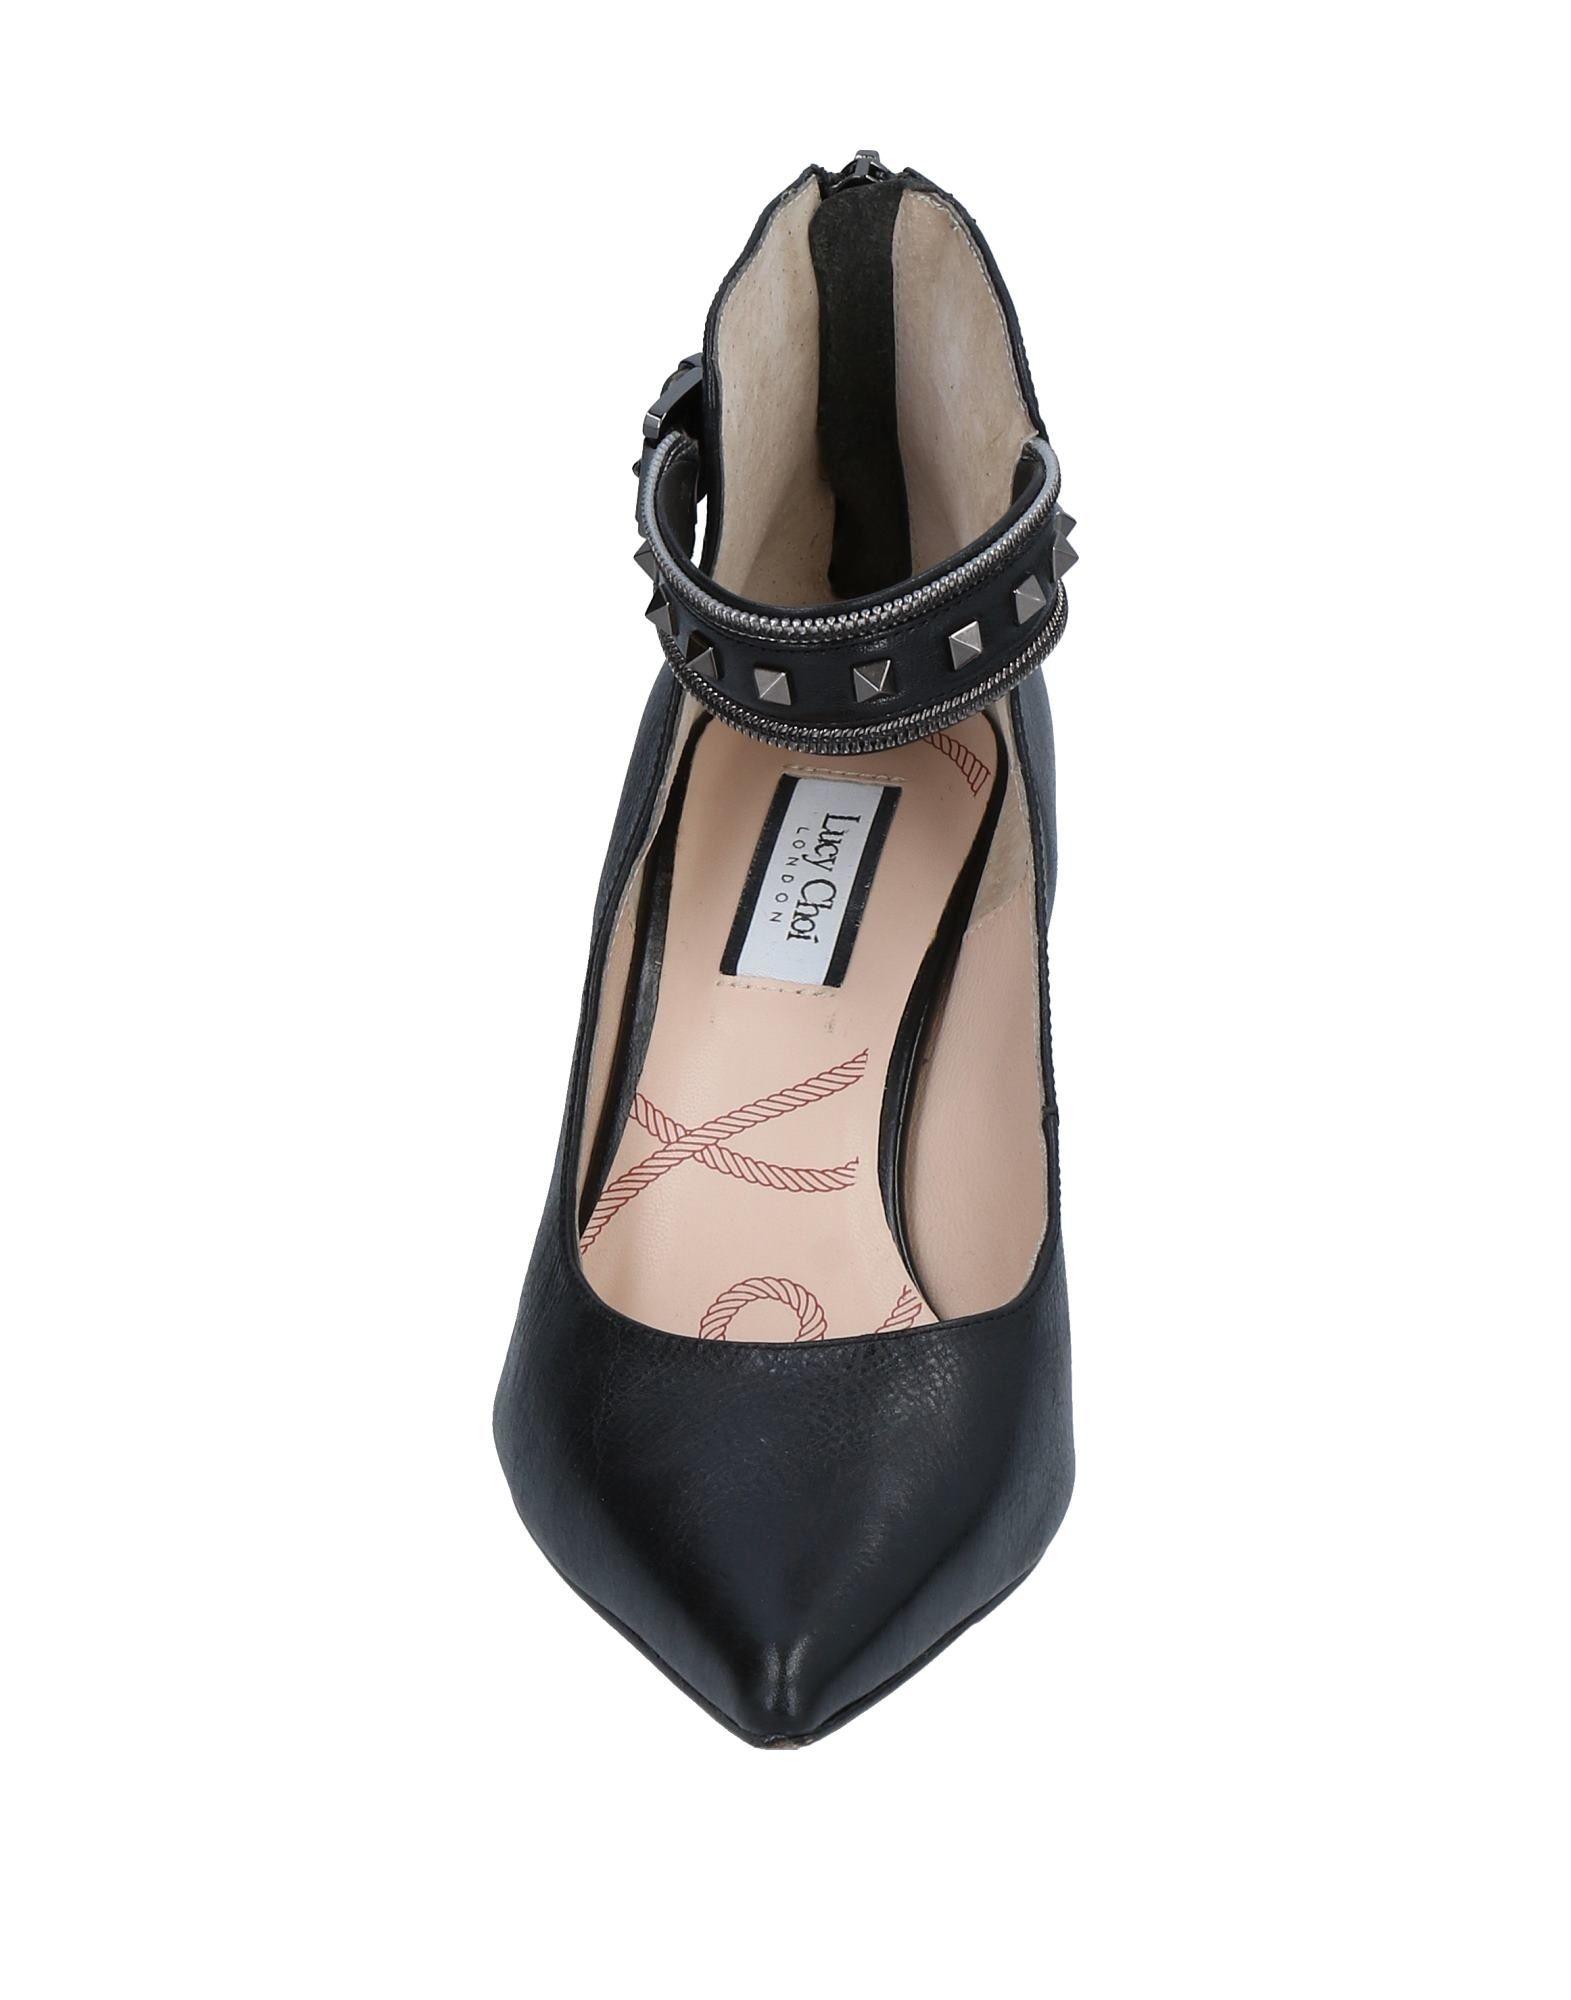 Stilvolle billige Schuhe Lucy Choi 11521888OR London Pumps Damen  11521888OR Choi c29e44